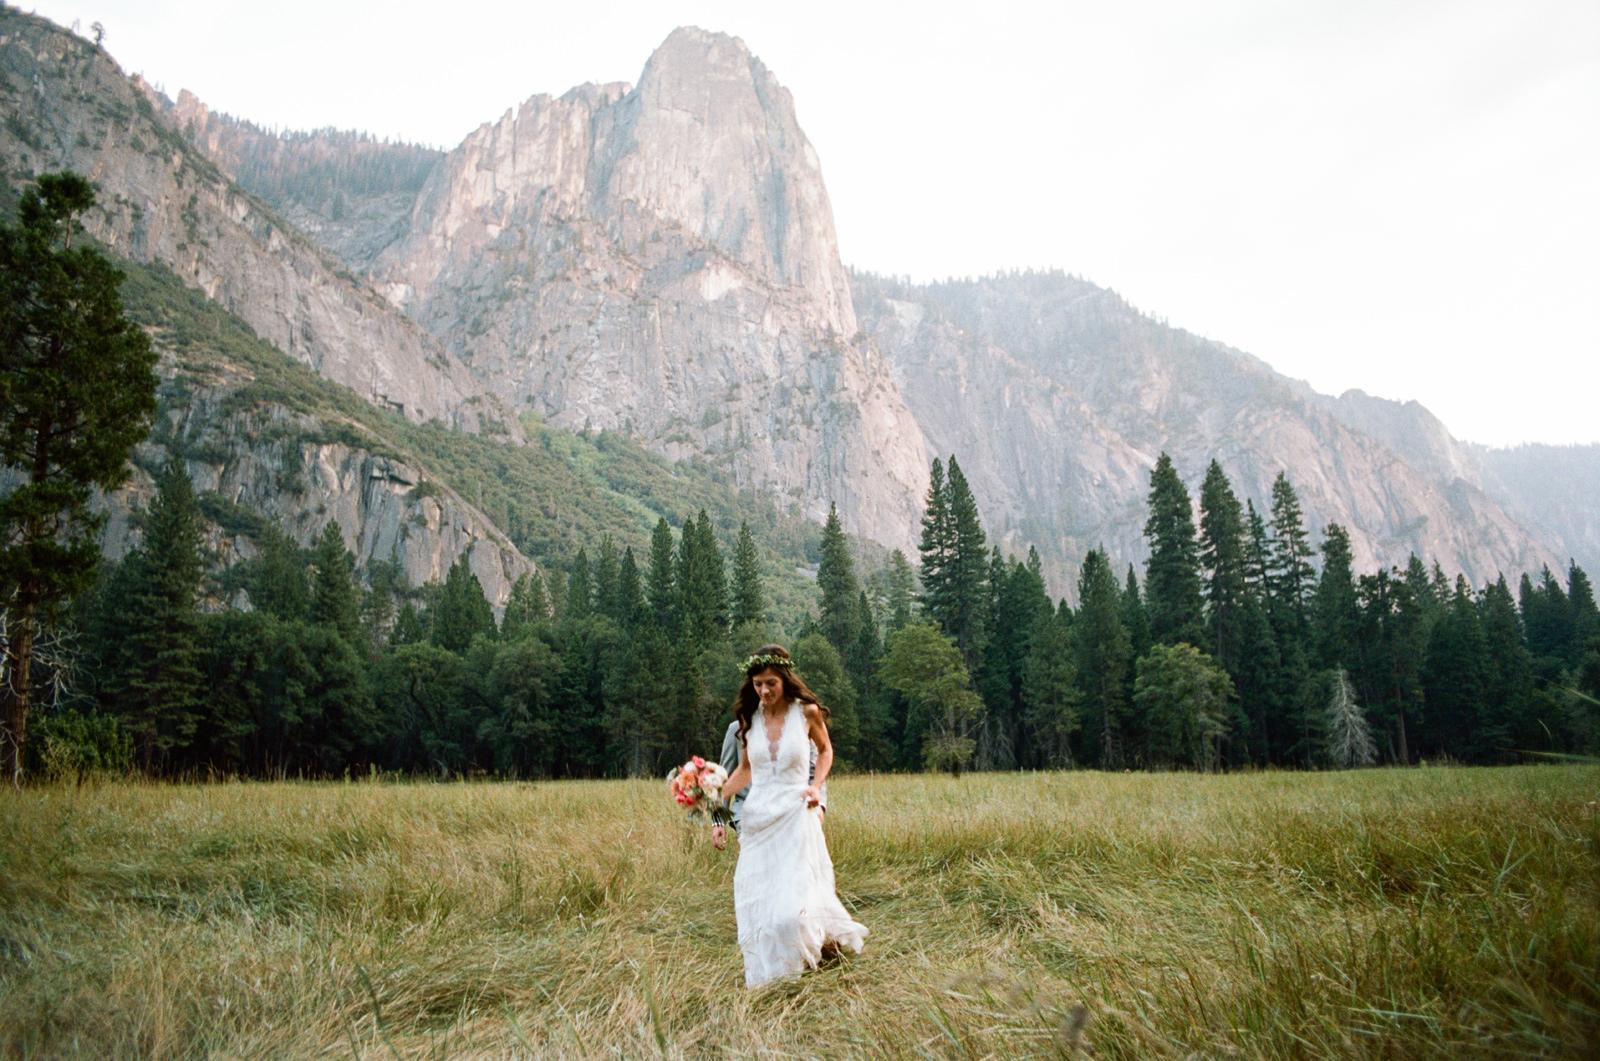 yosemite-intimate-wedding-091 YOSEMITE INTIMATE WEDDING